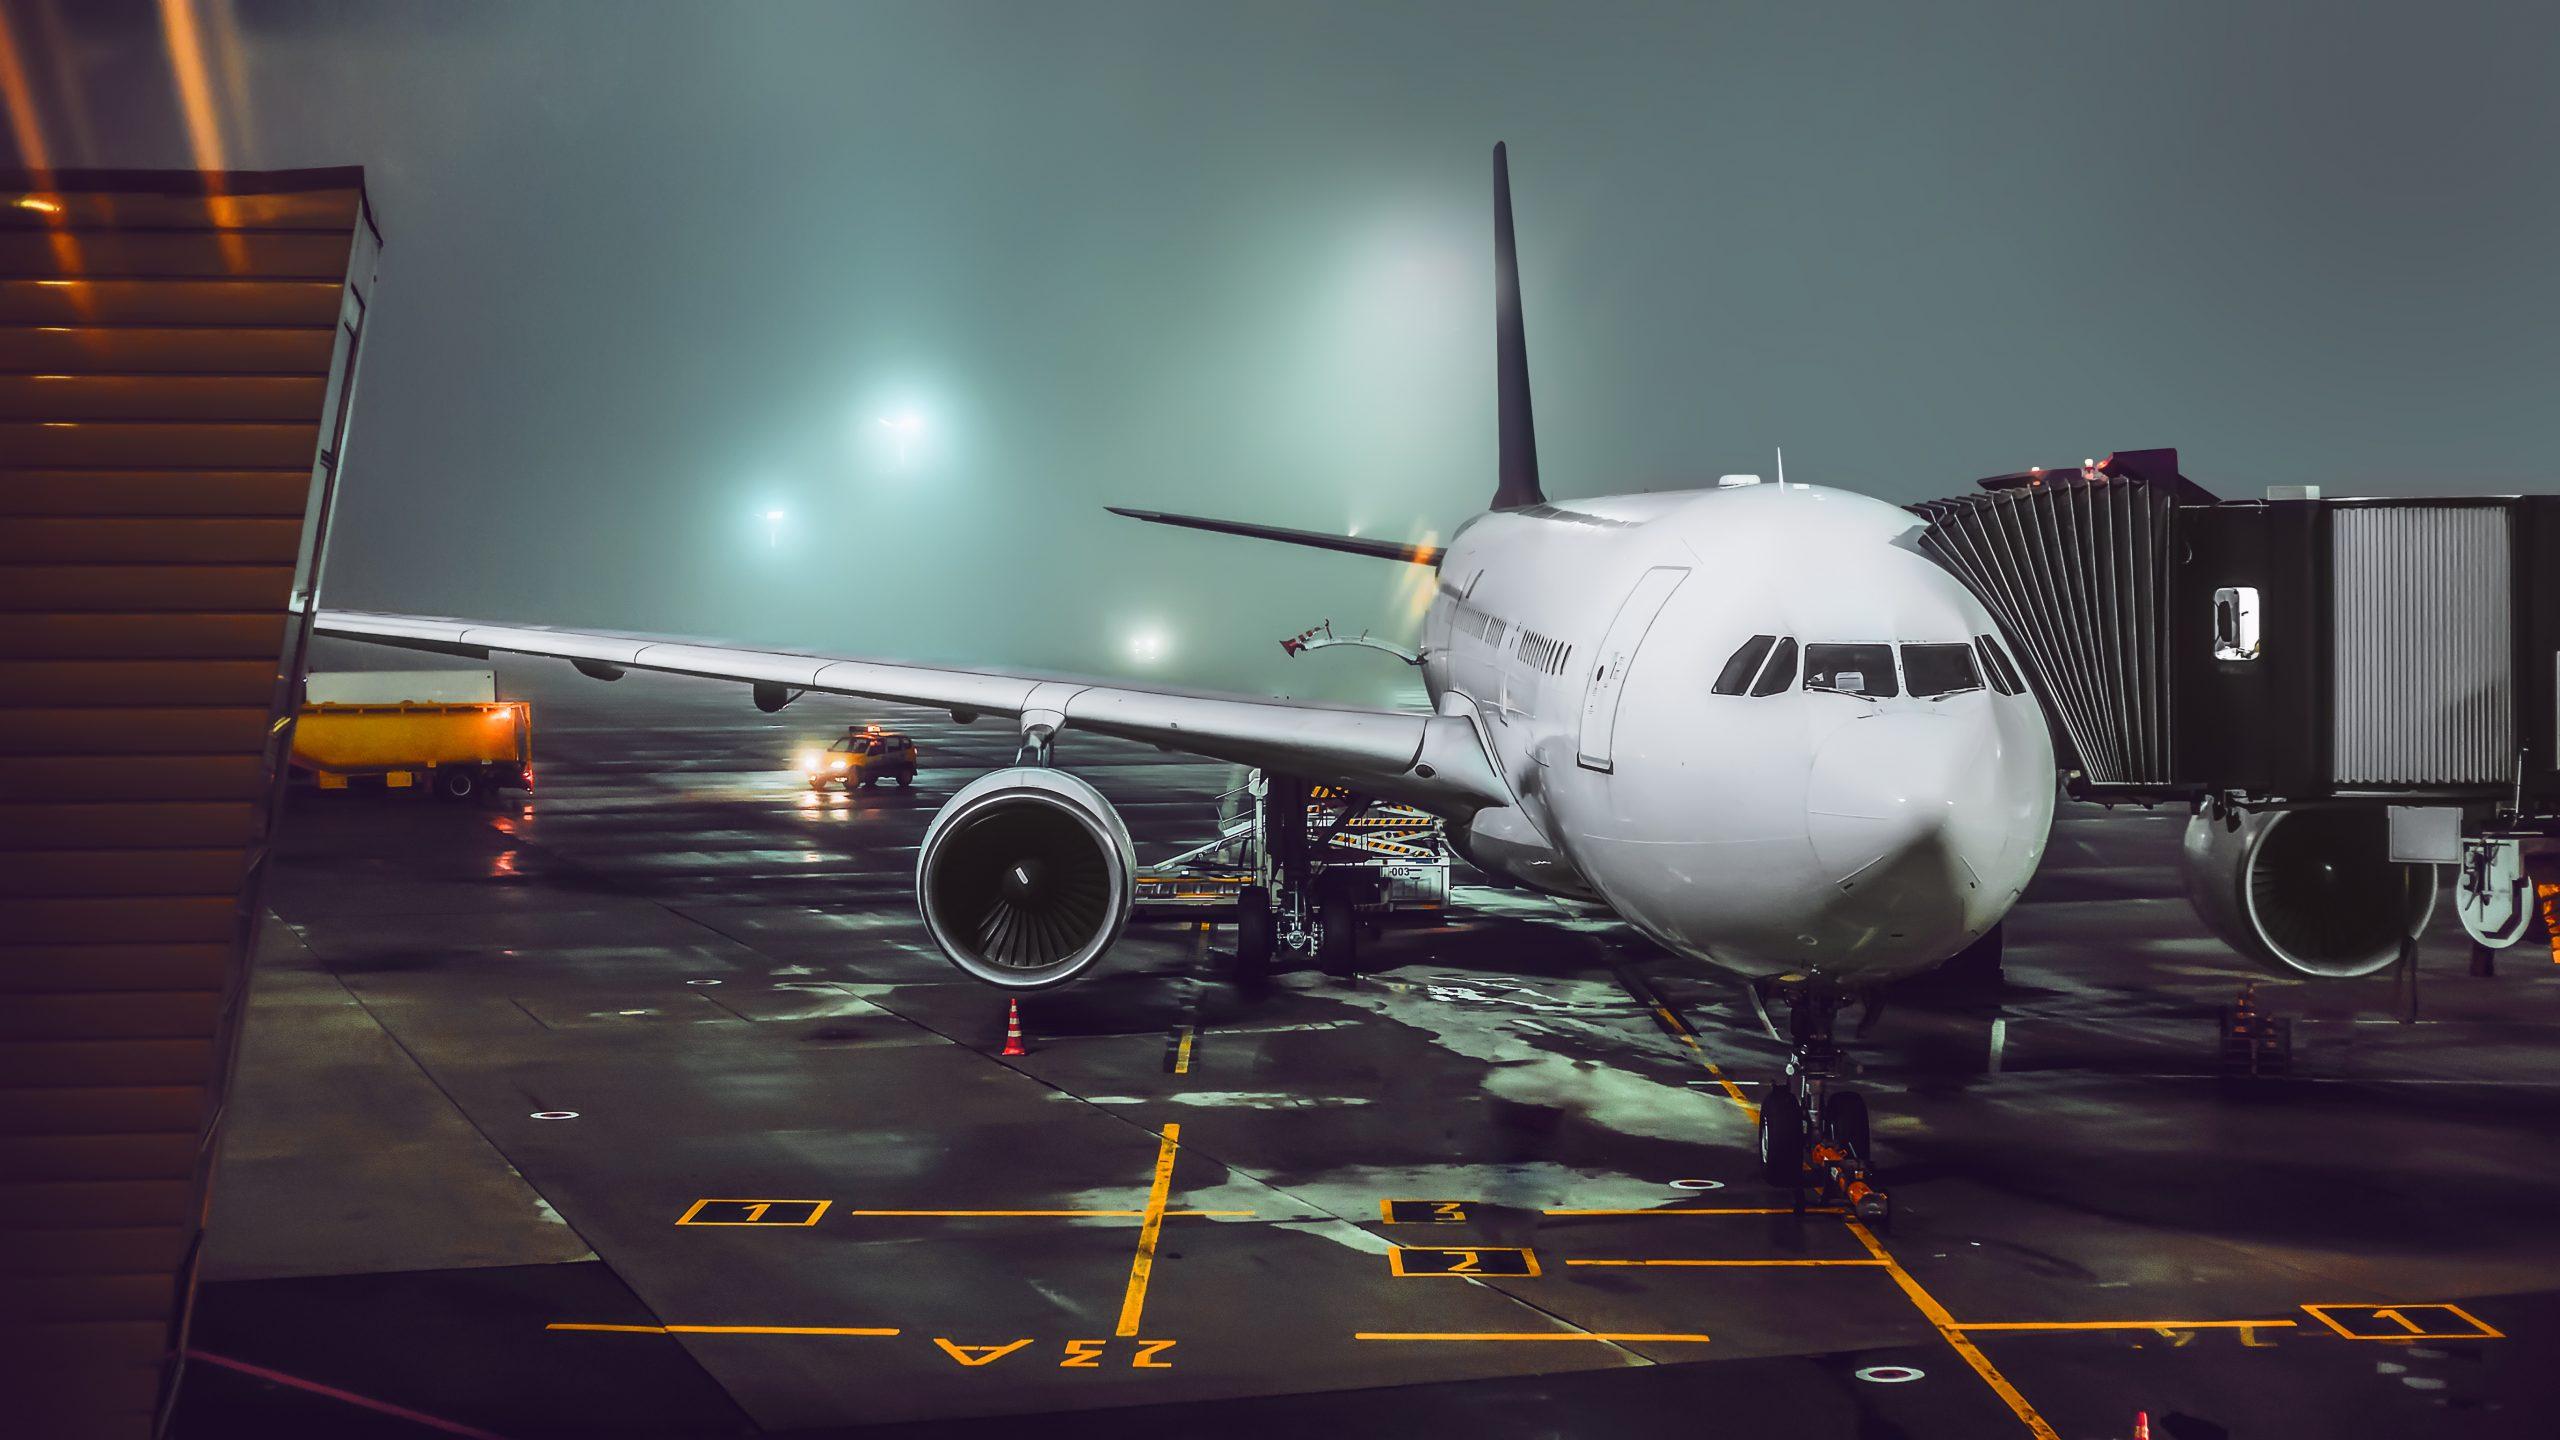 مواصلات مطار انطاليا الي الفندق Roomsfinder